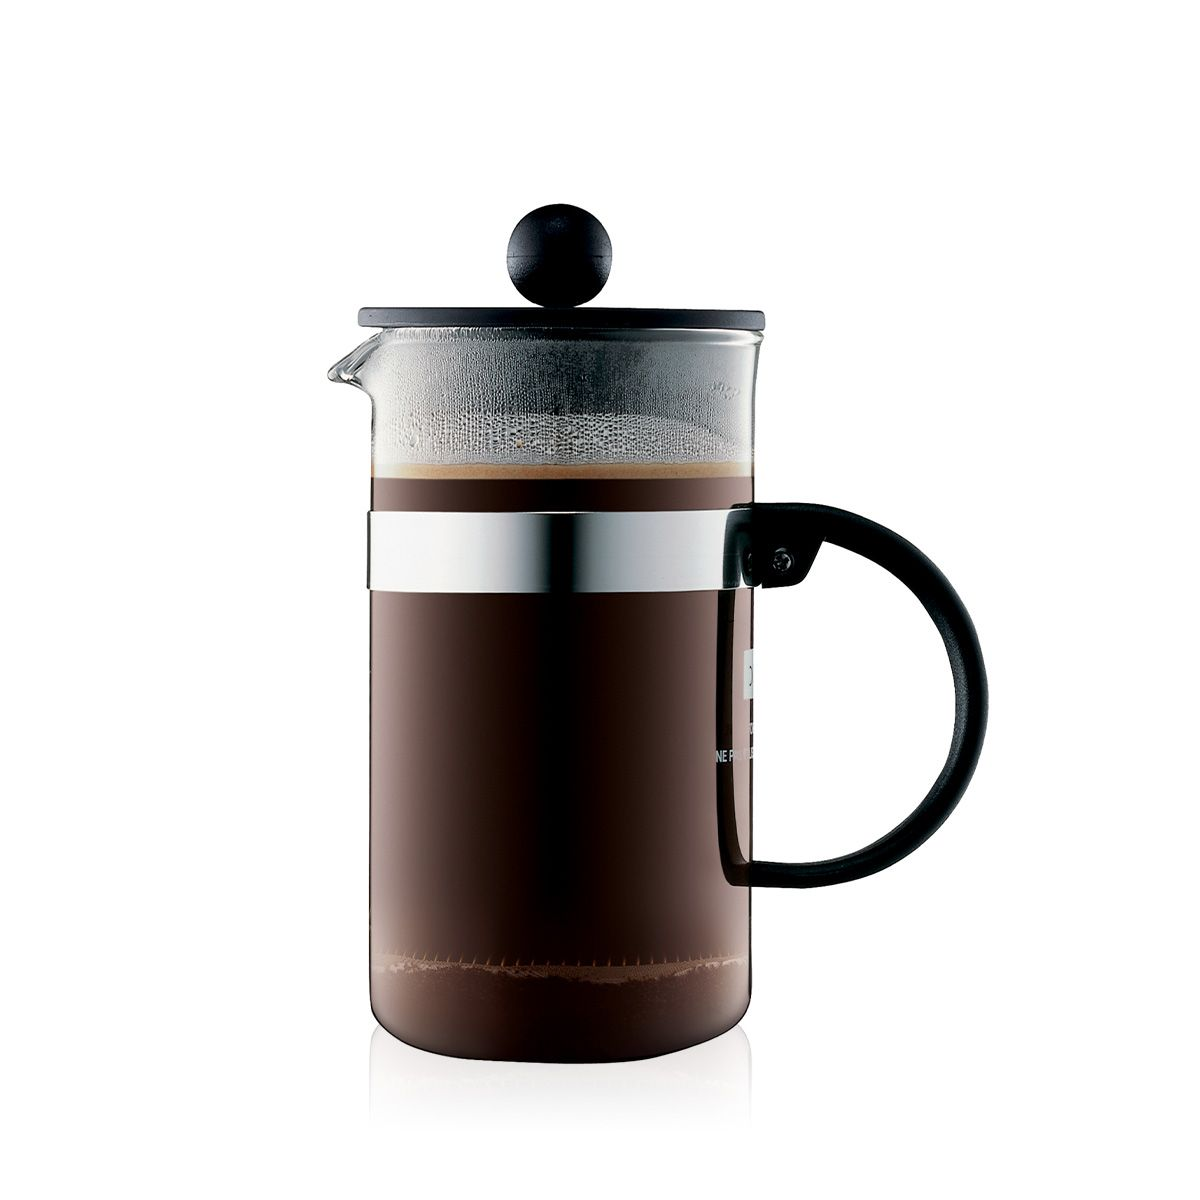 French Press Coffee Maker BISTRO NOUVEAU Bodum